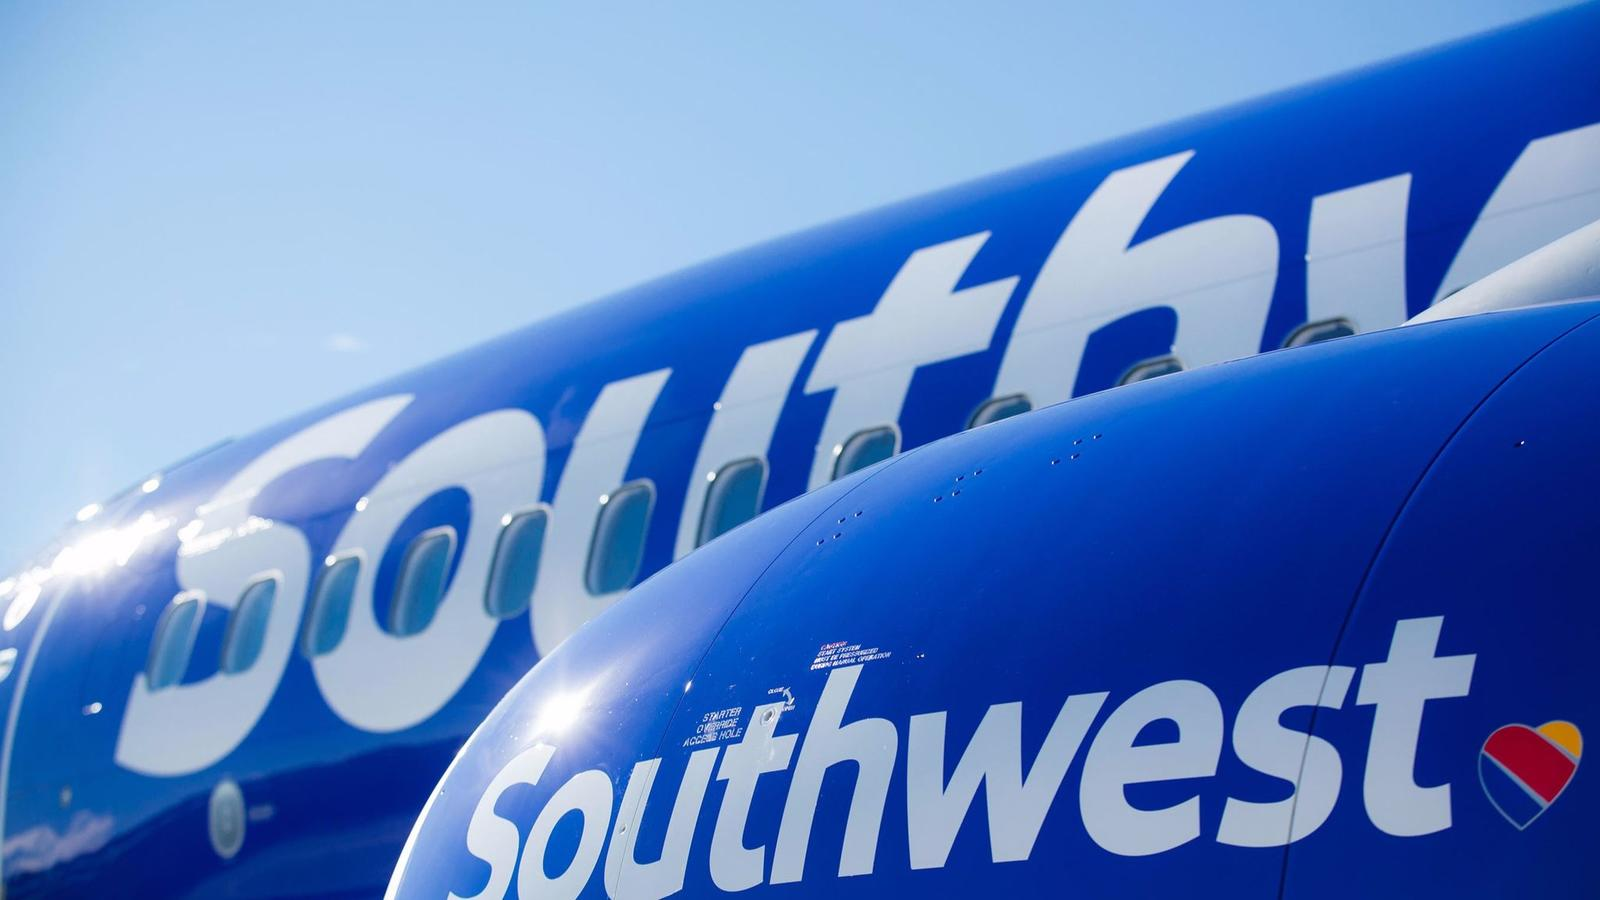 Will the 'Southwest Effect' lower the cost of Hawaiian flights? https://t.co/WyvxiFtH6o https://t.co/3bW1xHndeU